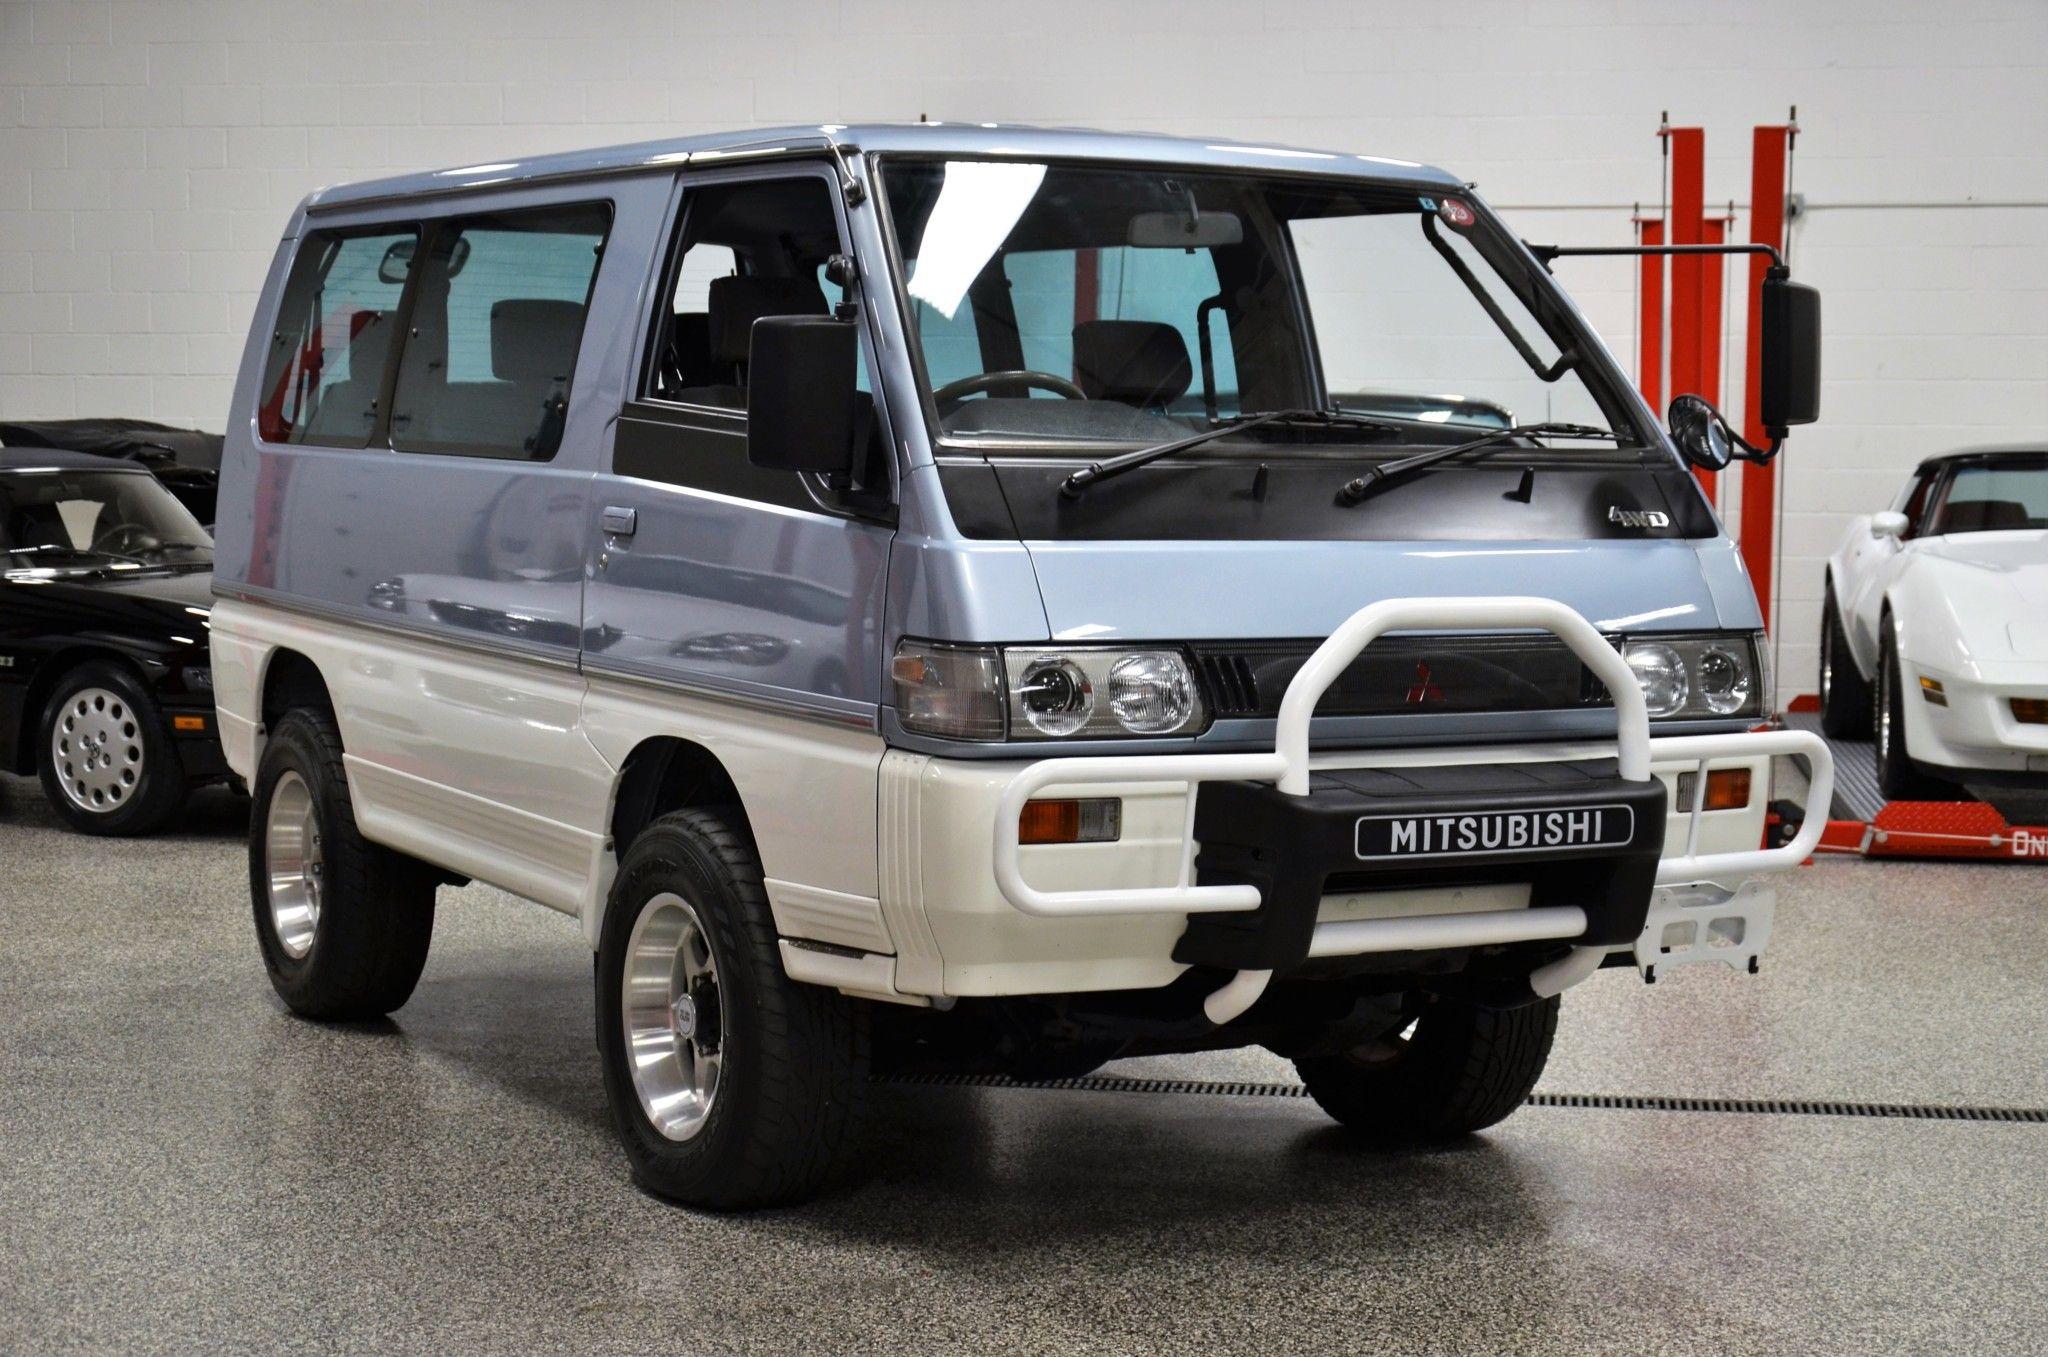 1991 Mitsubishi Delica L300 Star Wagon Turbodiesel 4 4 5 Speed Mitsubishi Wagon 4x4